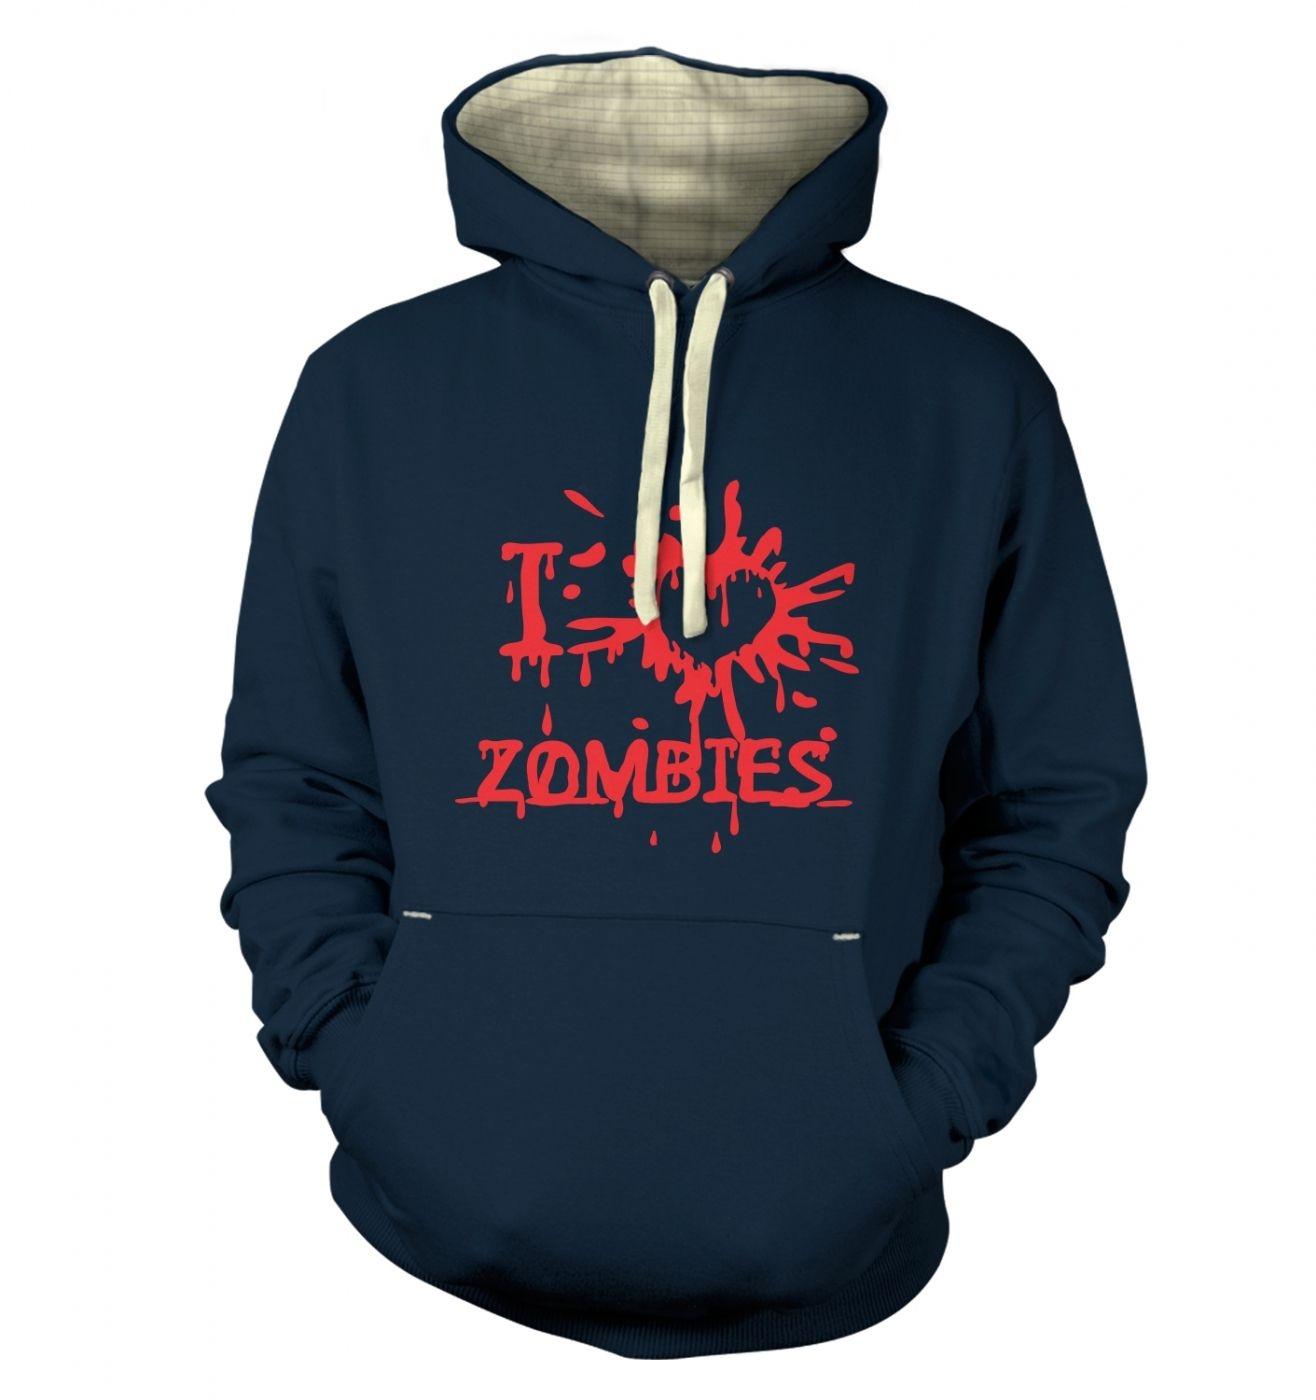 I heart Zombies Adult Premium Hoodie